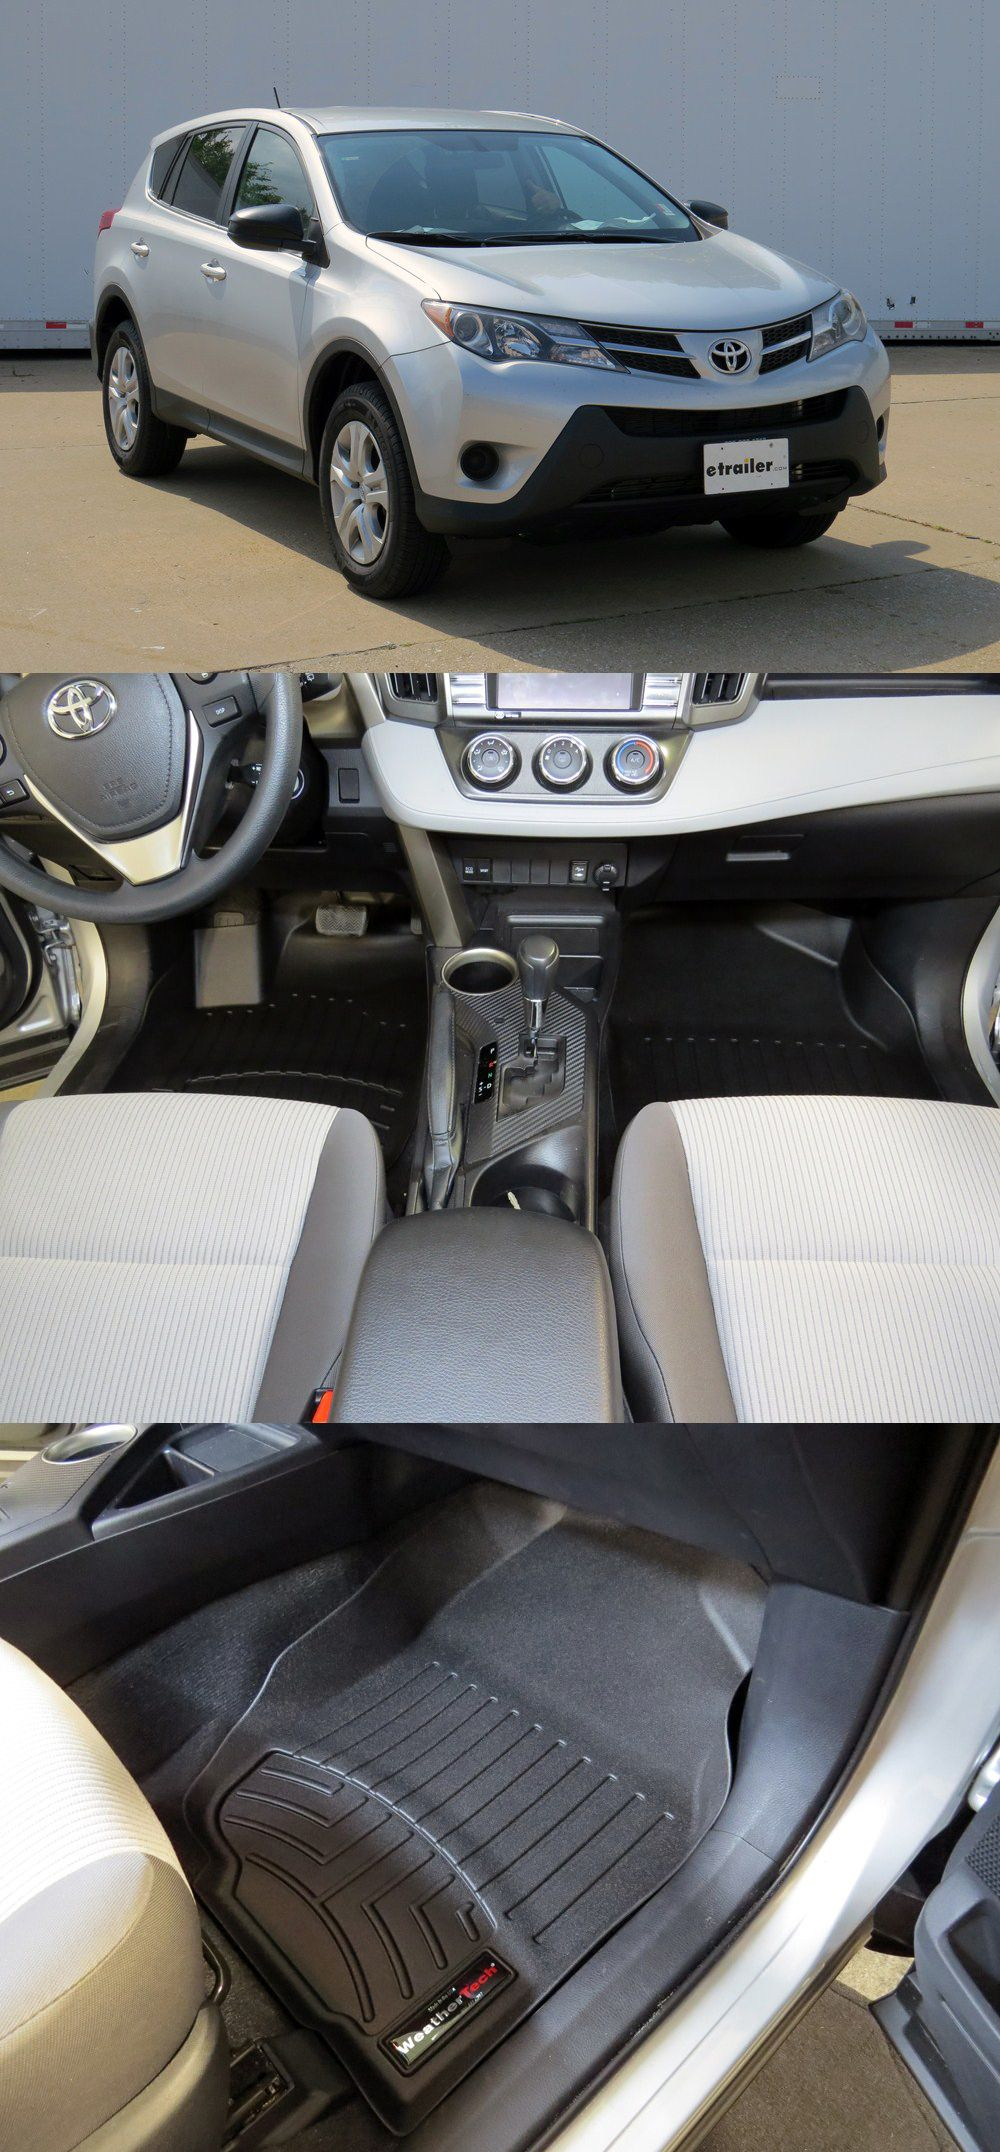 Floor mats rav4 - Keep The Inside Of Your Toyota Rav4 Clean With The Weathertech Floor Mats Unique